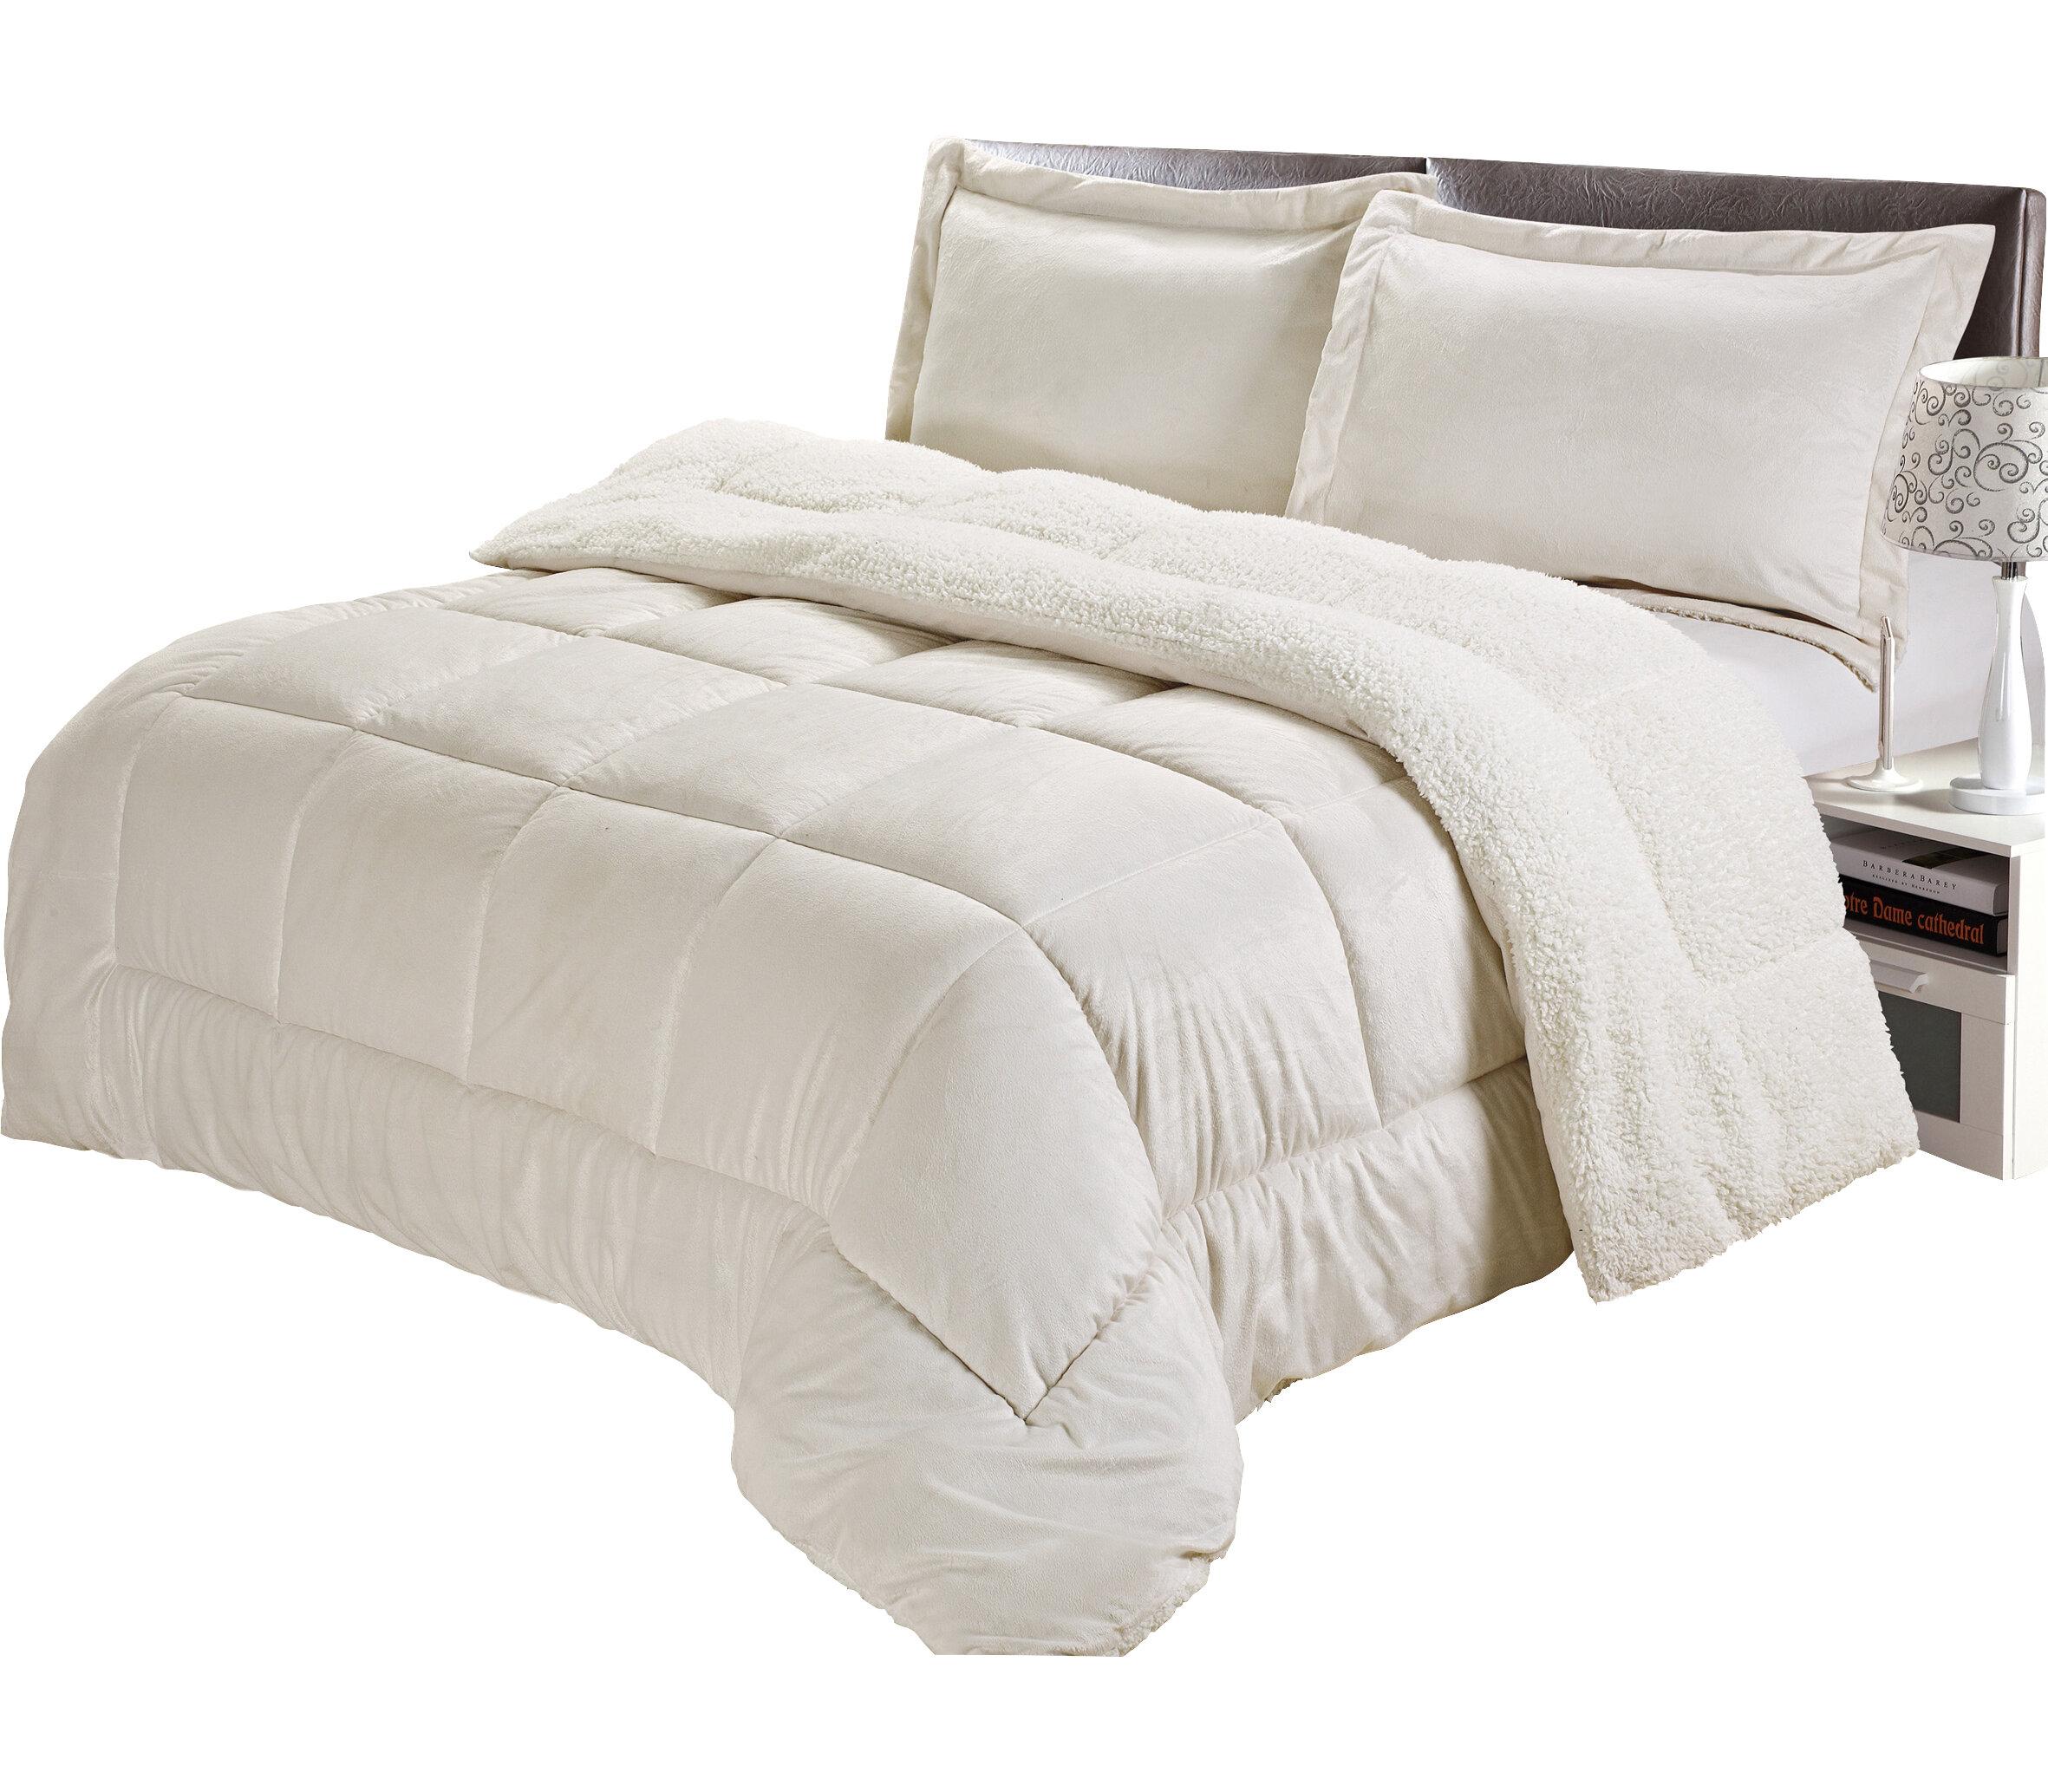 for comforter sets bedding canada bedrooms master different cream set variations